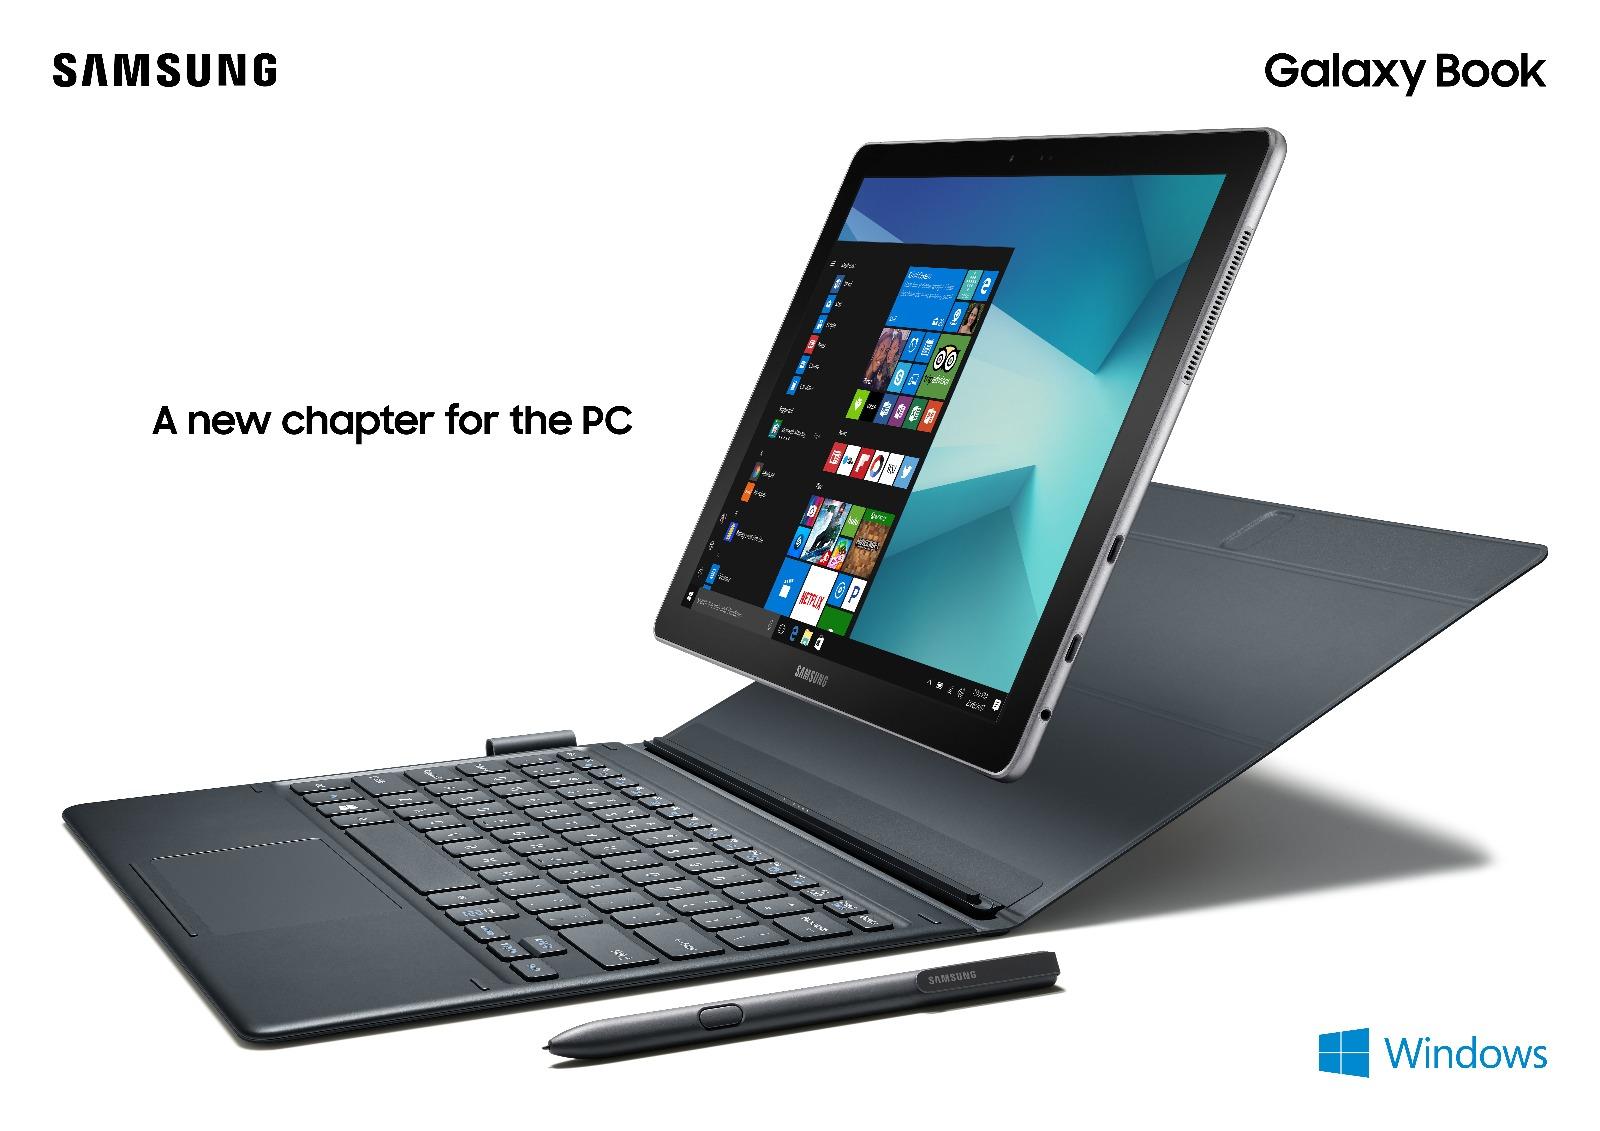 Samsung představil Galaxy Book, Galaxy Tab S3 a Gear VR s ovladačem